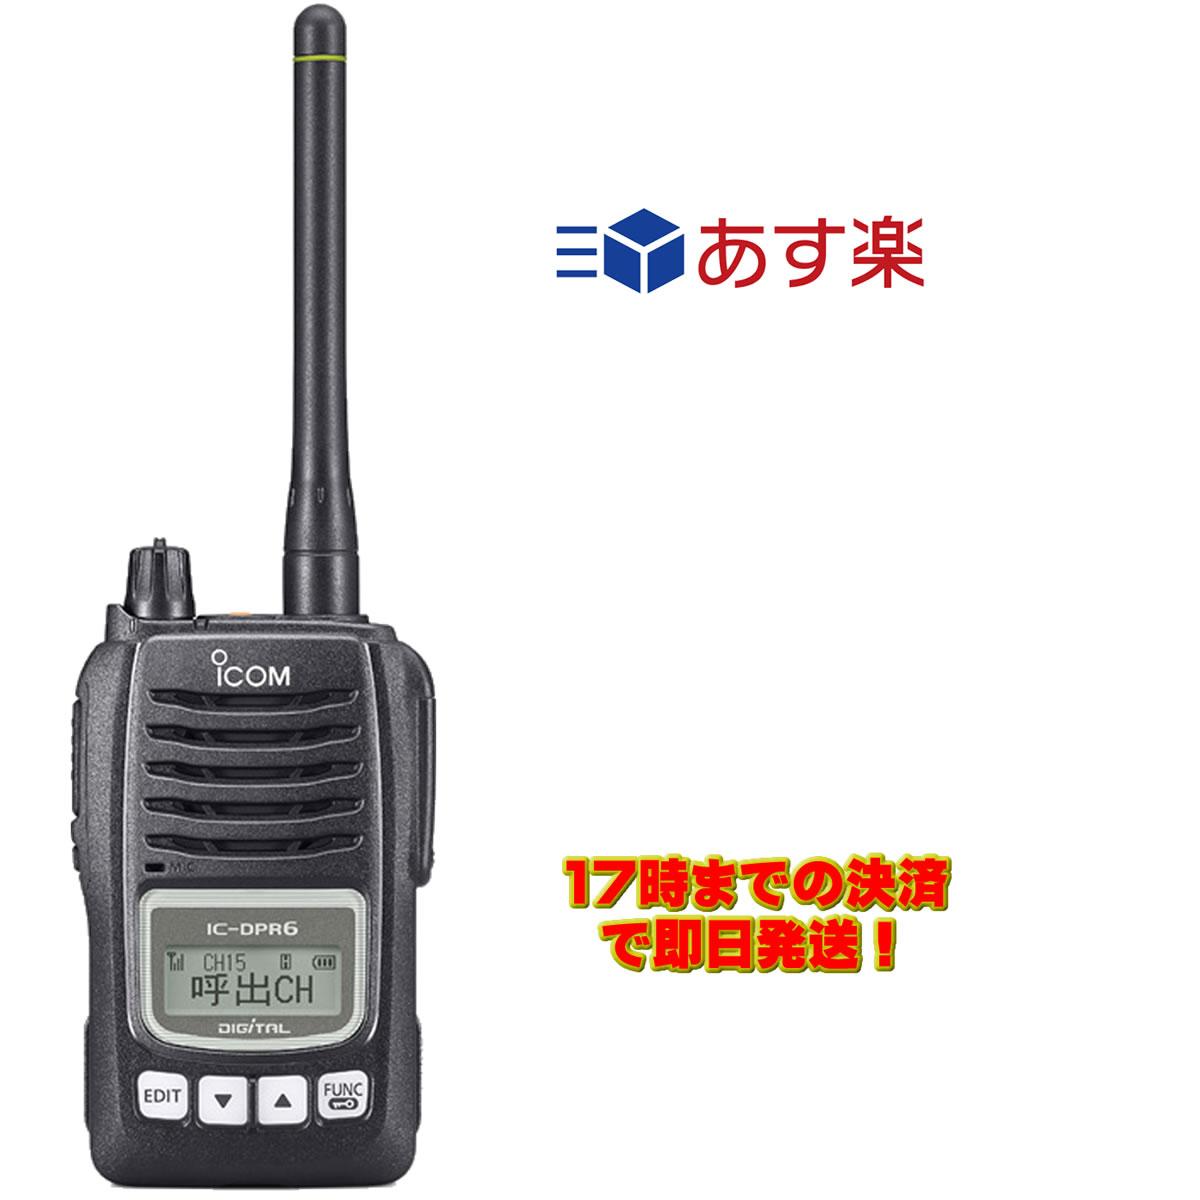 IC-DPR6 アイコム 携帯型デジタルトランシーバー 5W 30CH